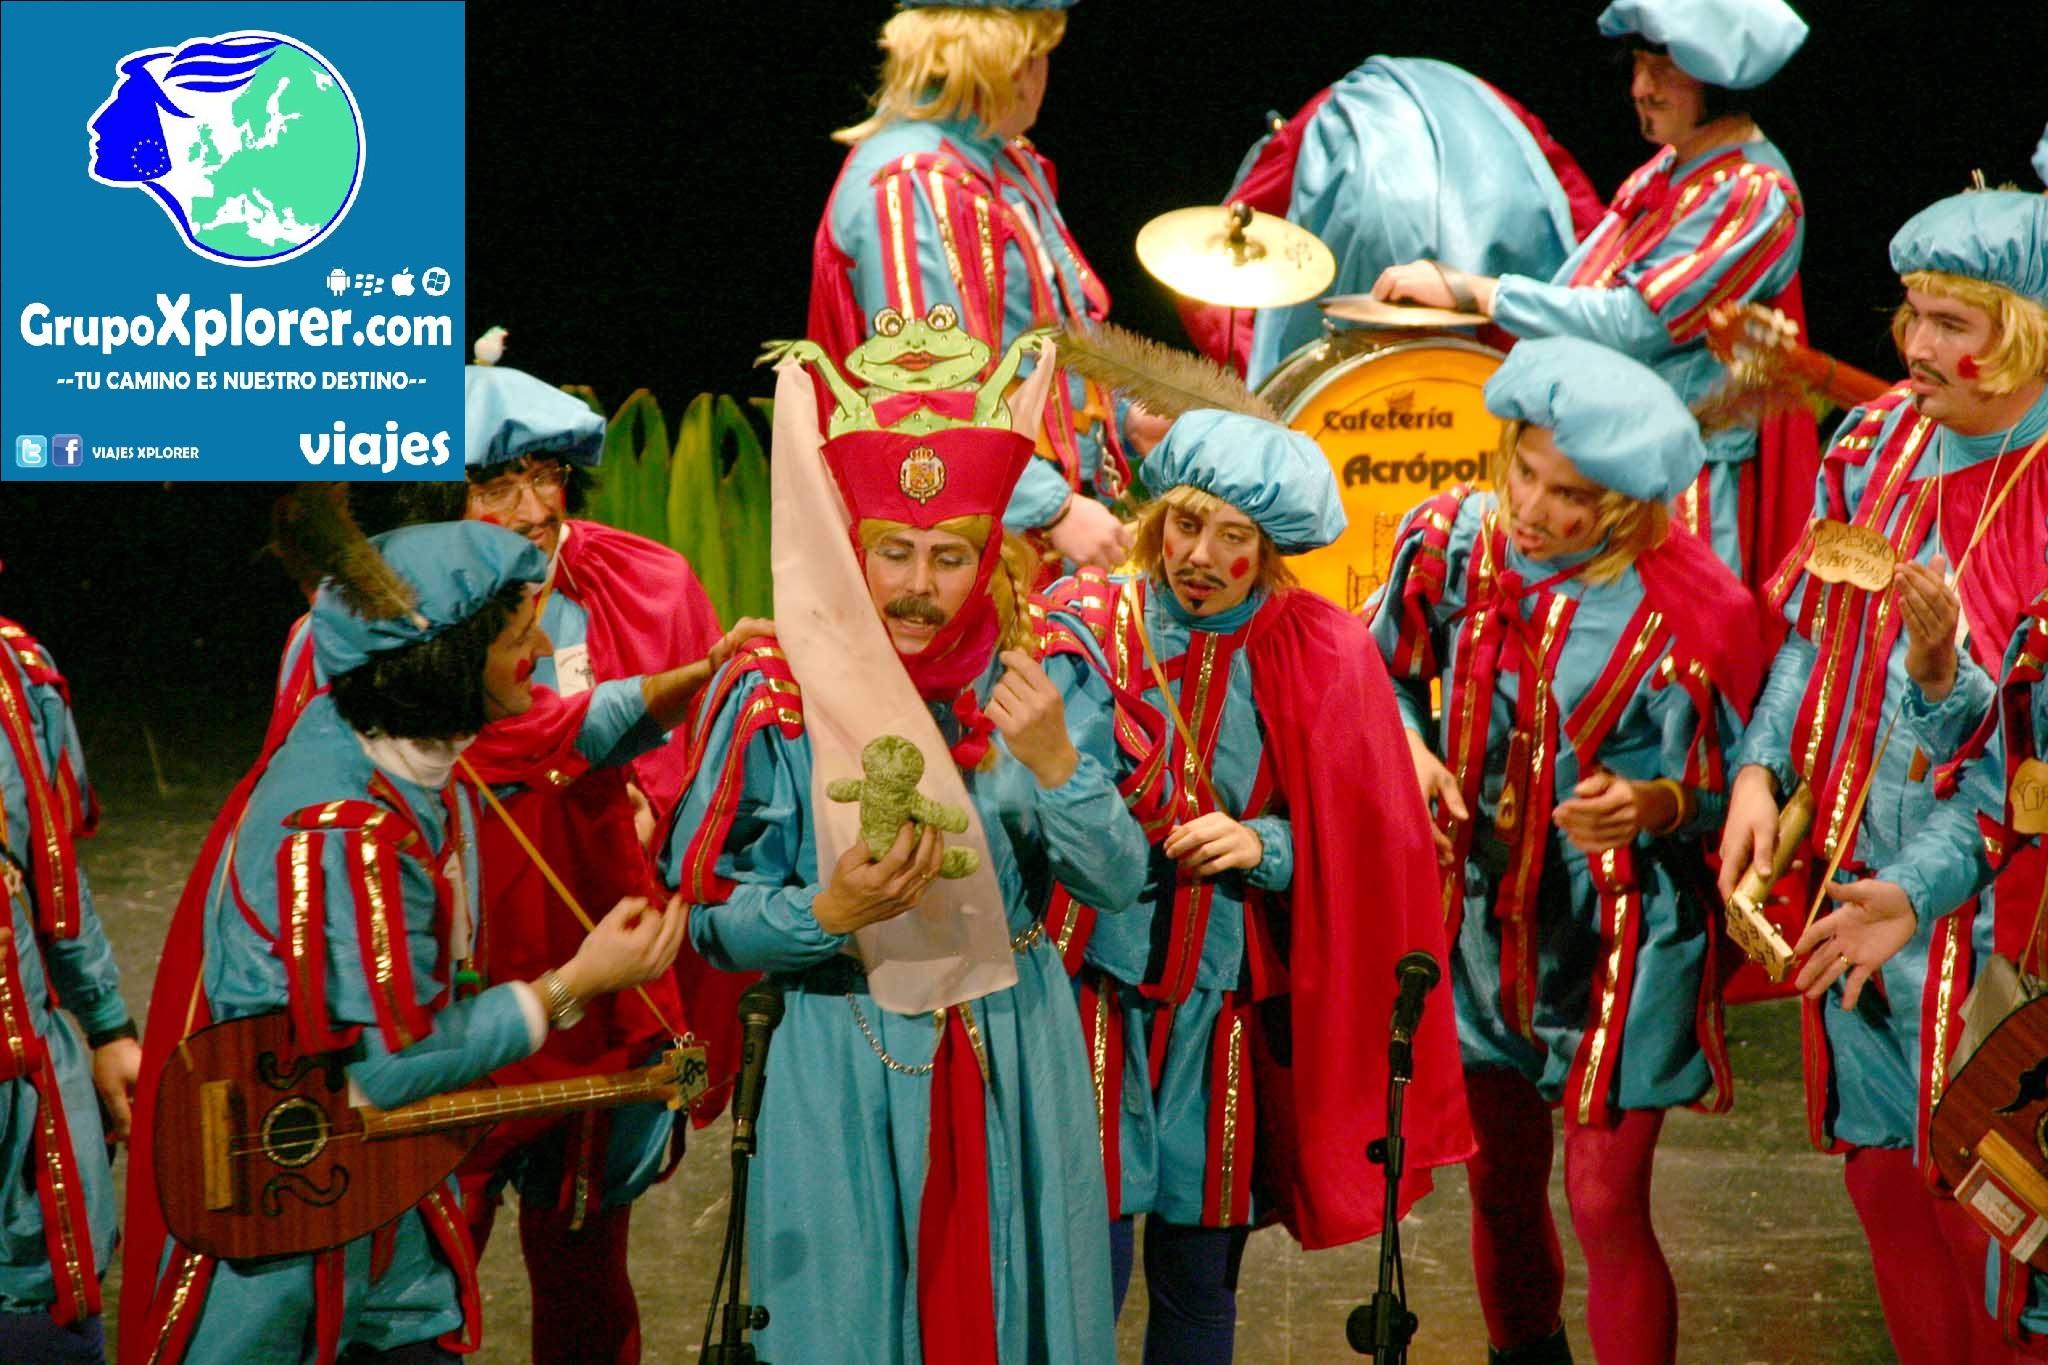 Festival de Carnaval